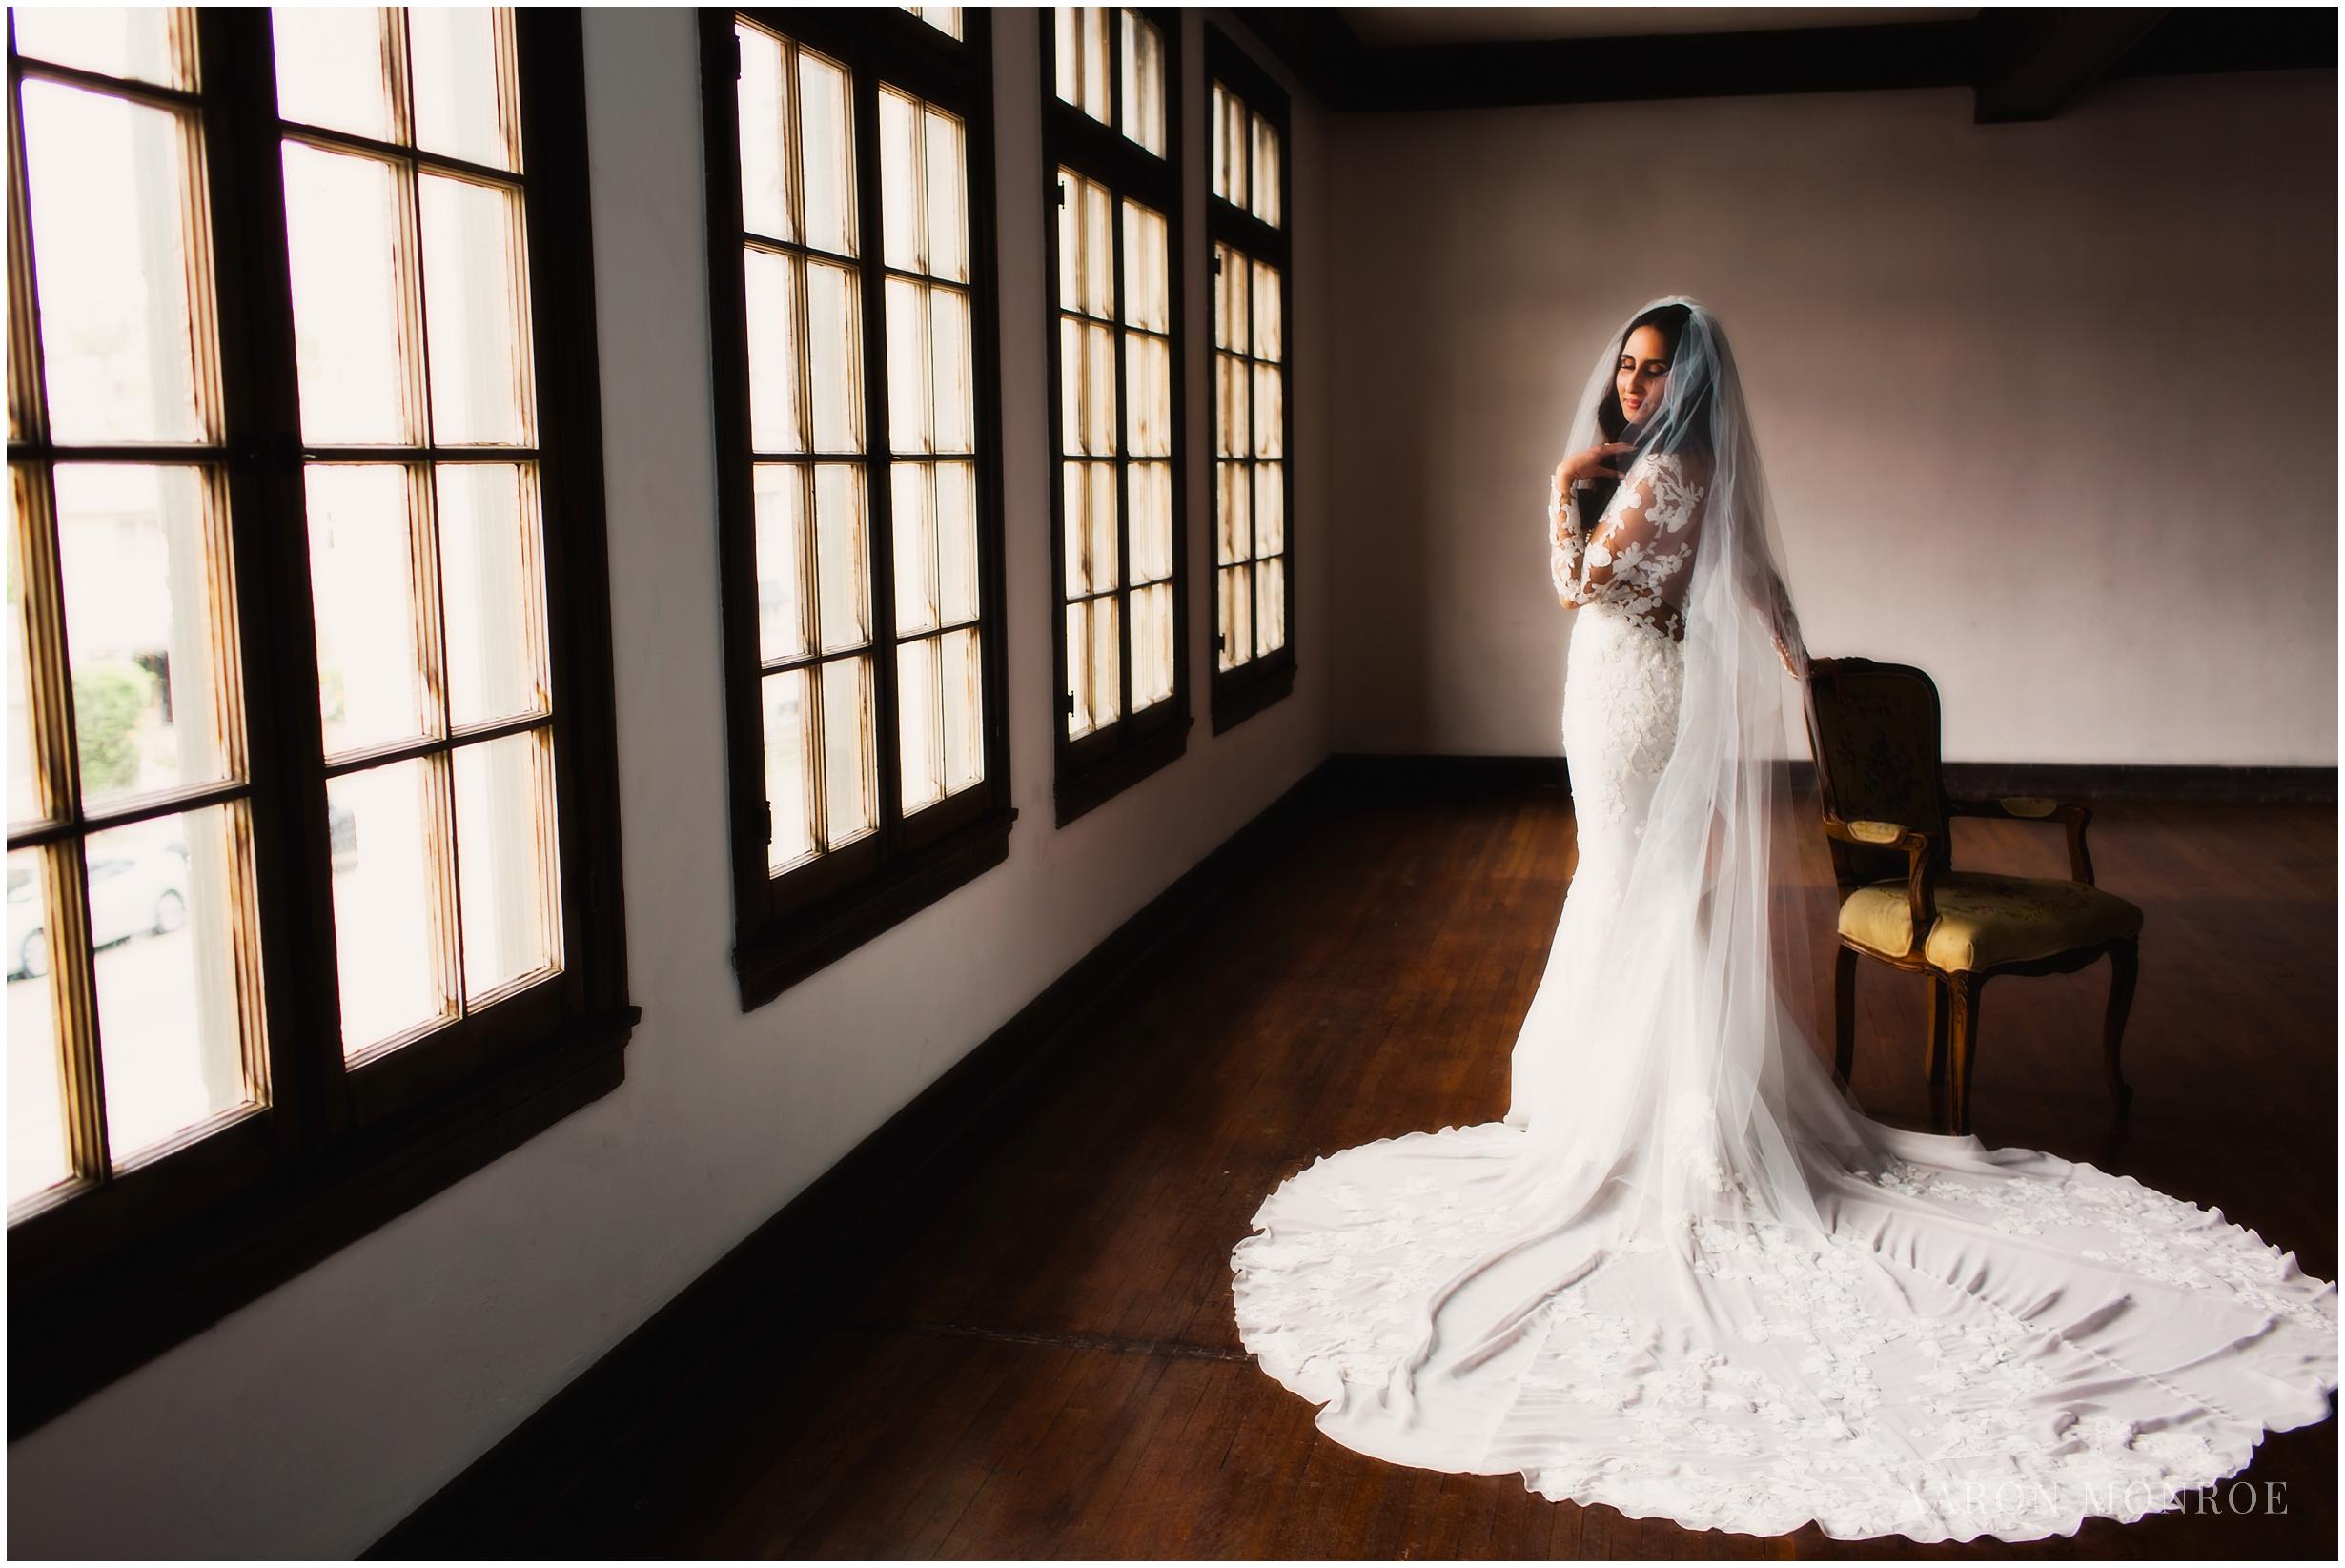 Ebell_Long_Beach_Wedding_Photography_0819.jpg